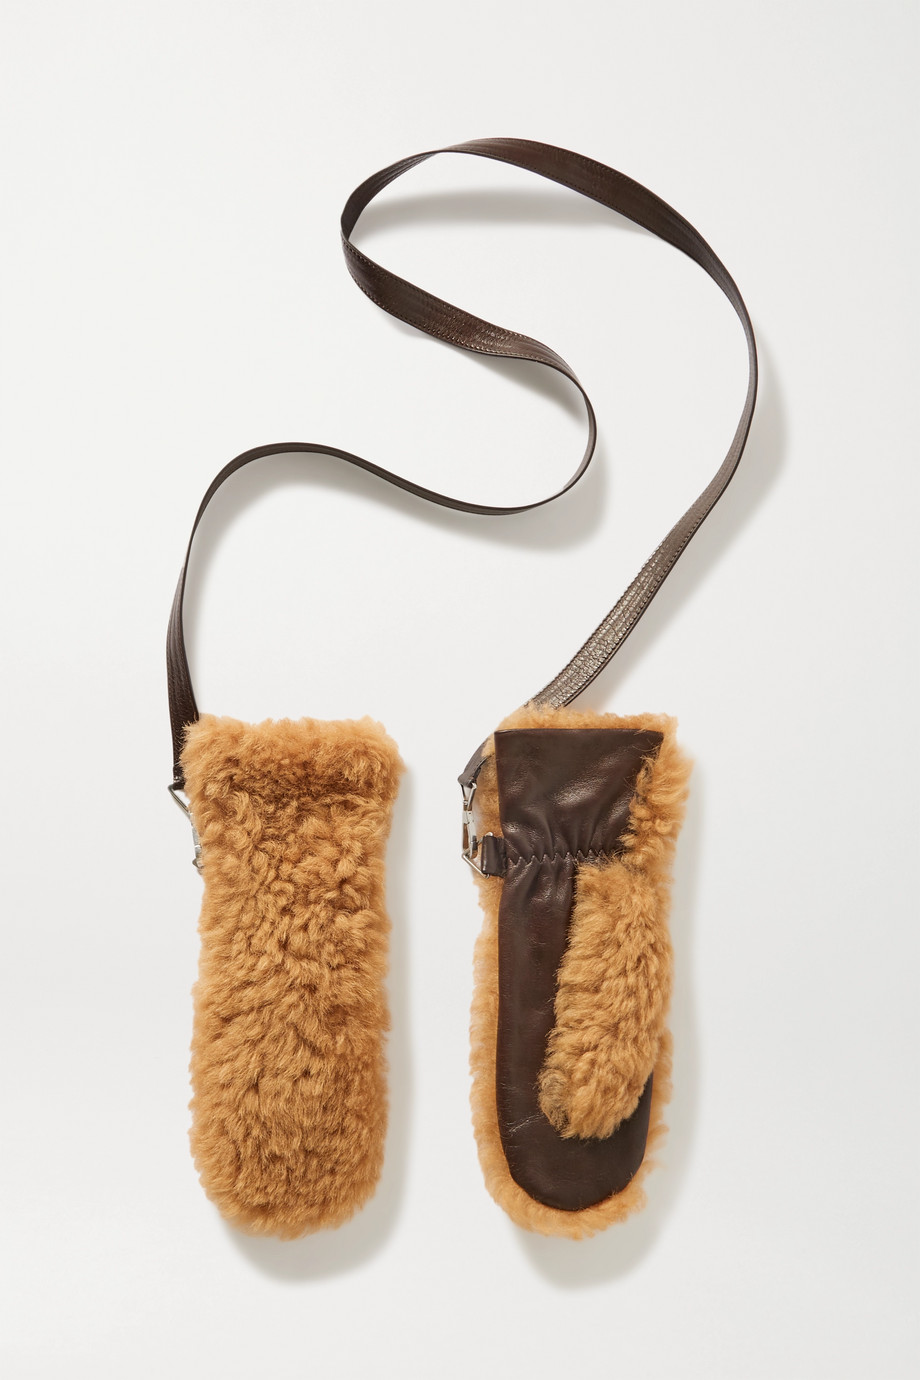 Bottega Veneta Shearling and leather mittens